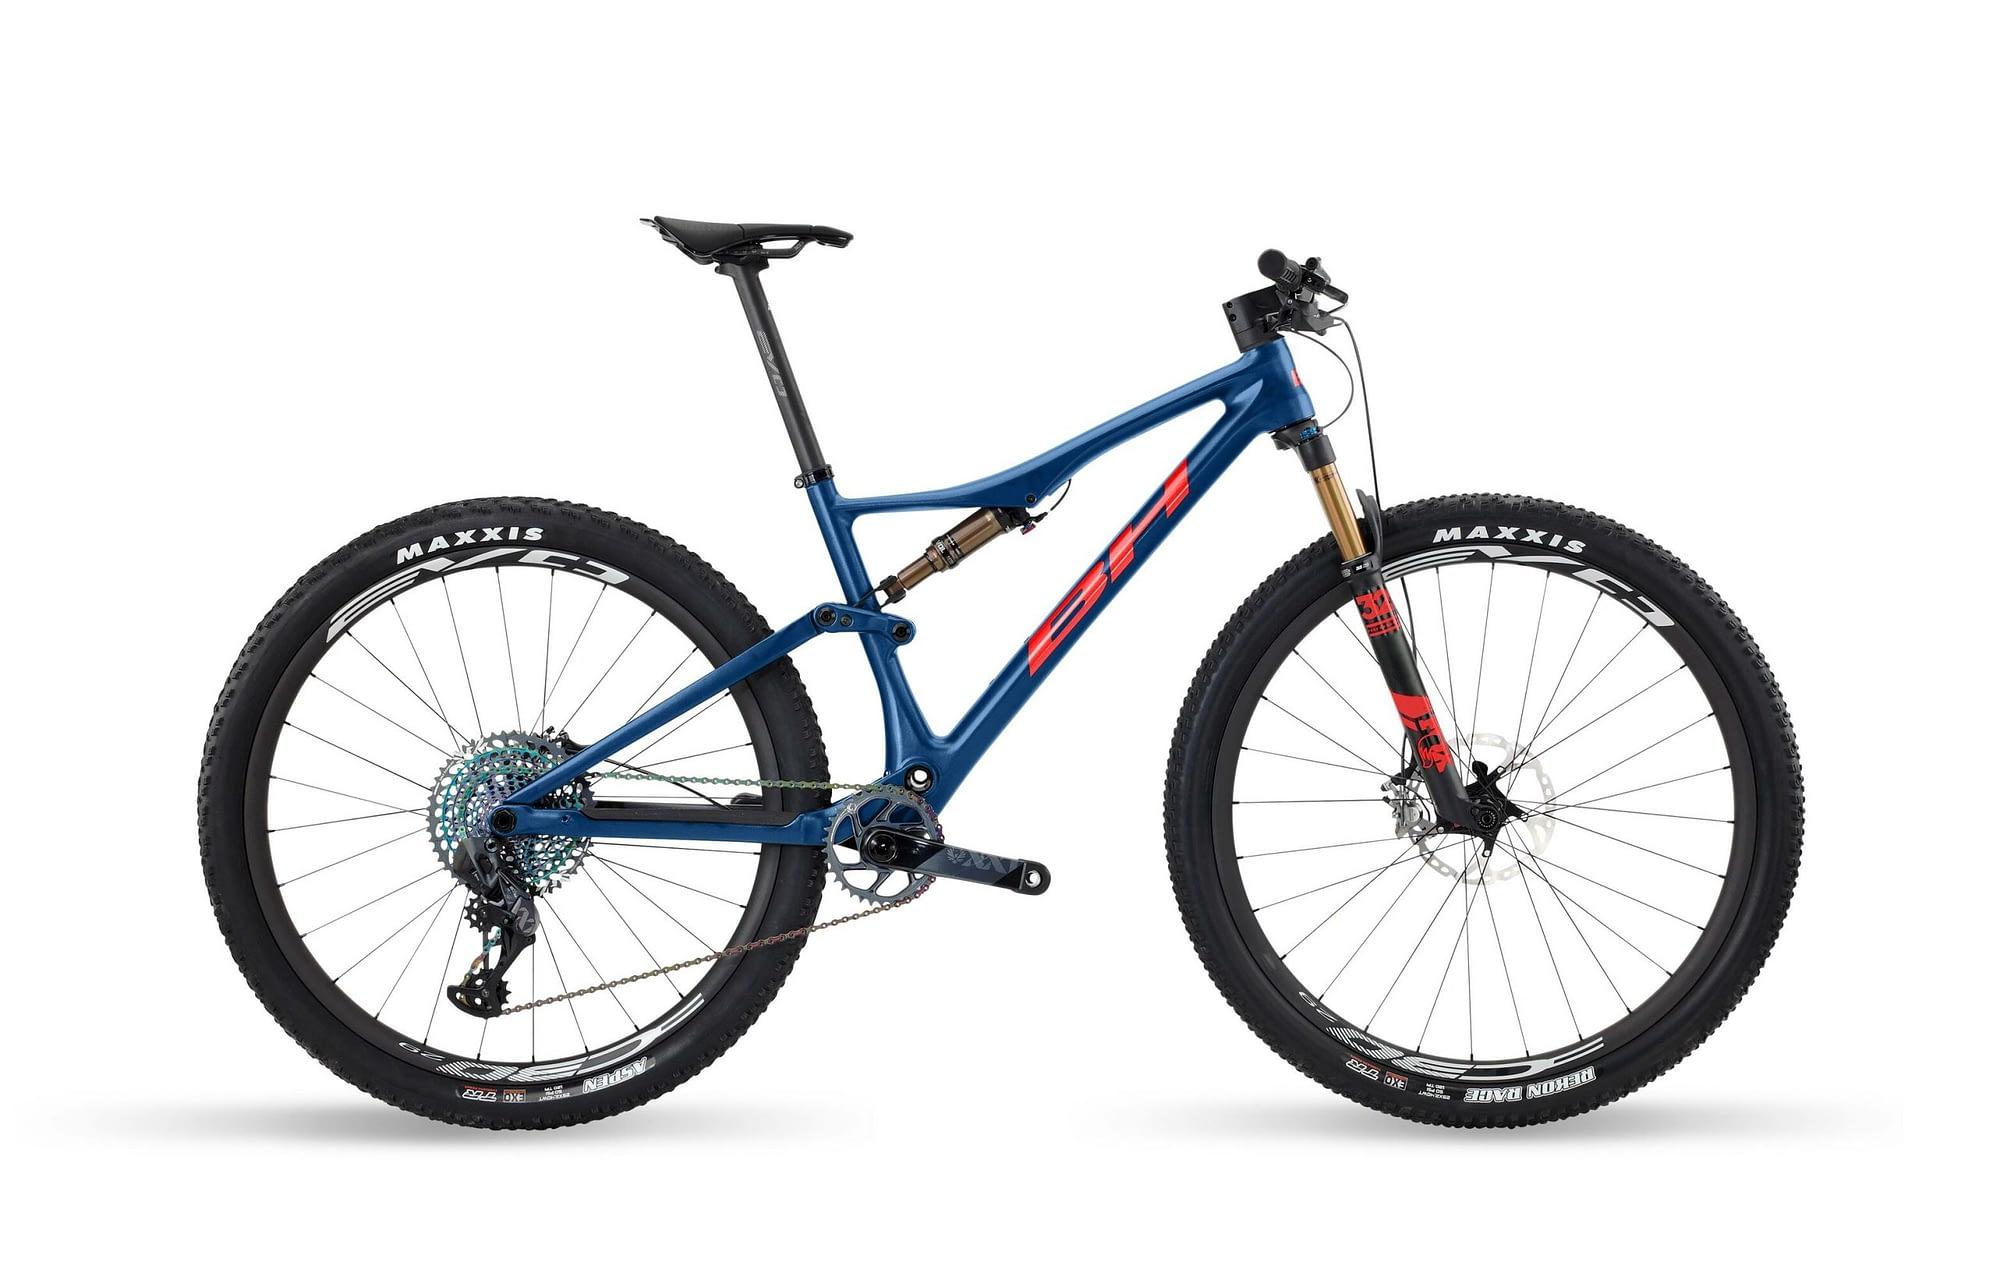 BH LYNX RACE EVO CARBON 9.9 - Rouge / Bleu, XL